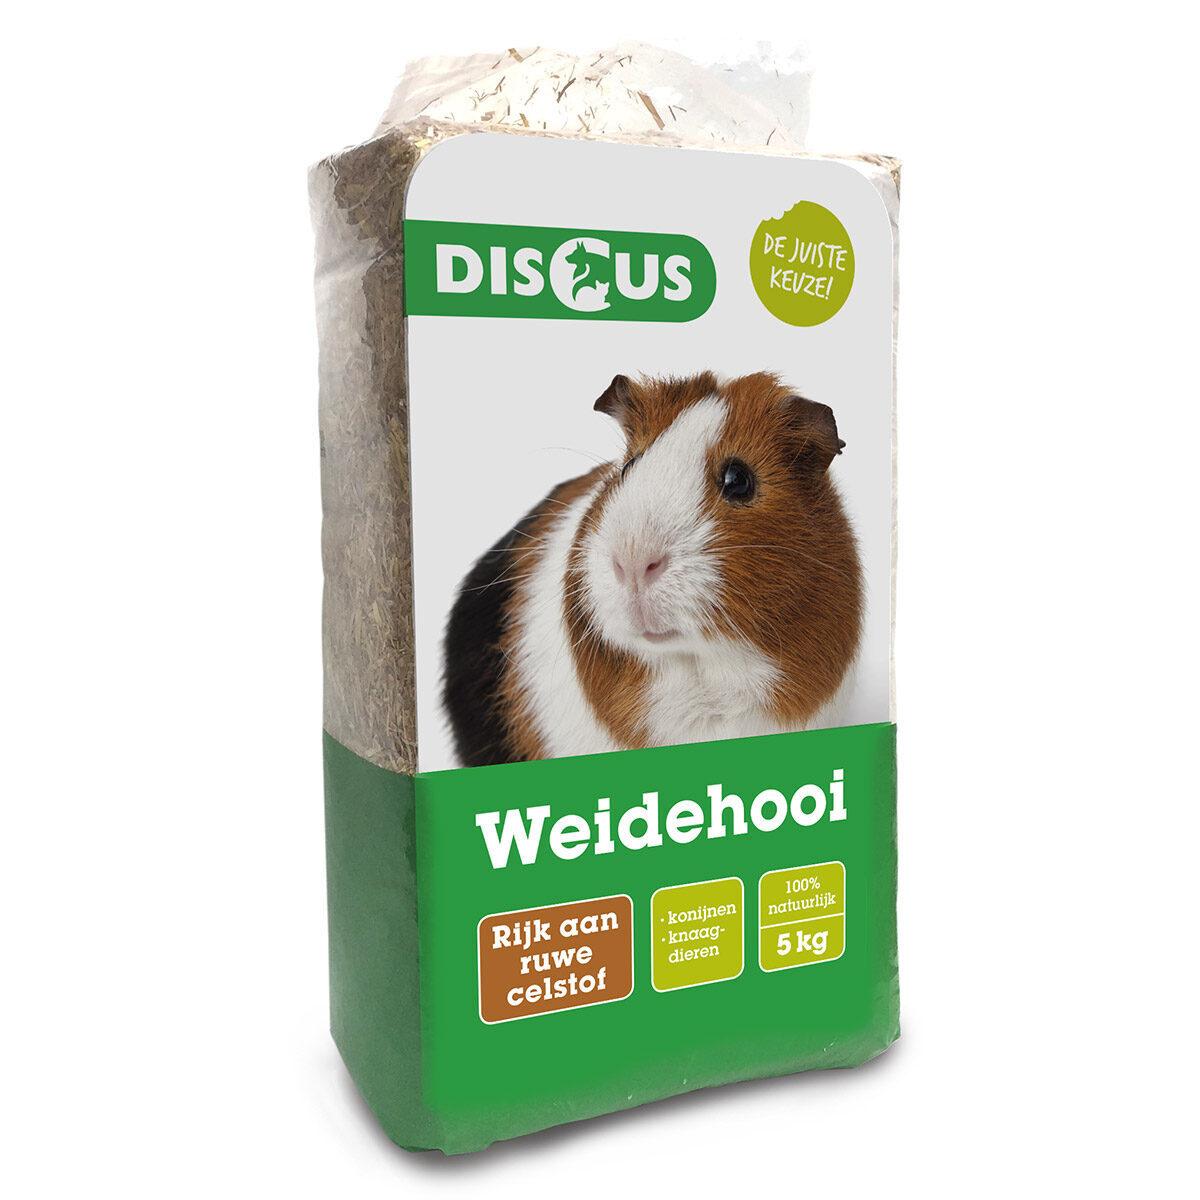 weidehooi-5kg.jpg